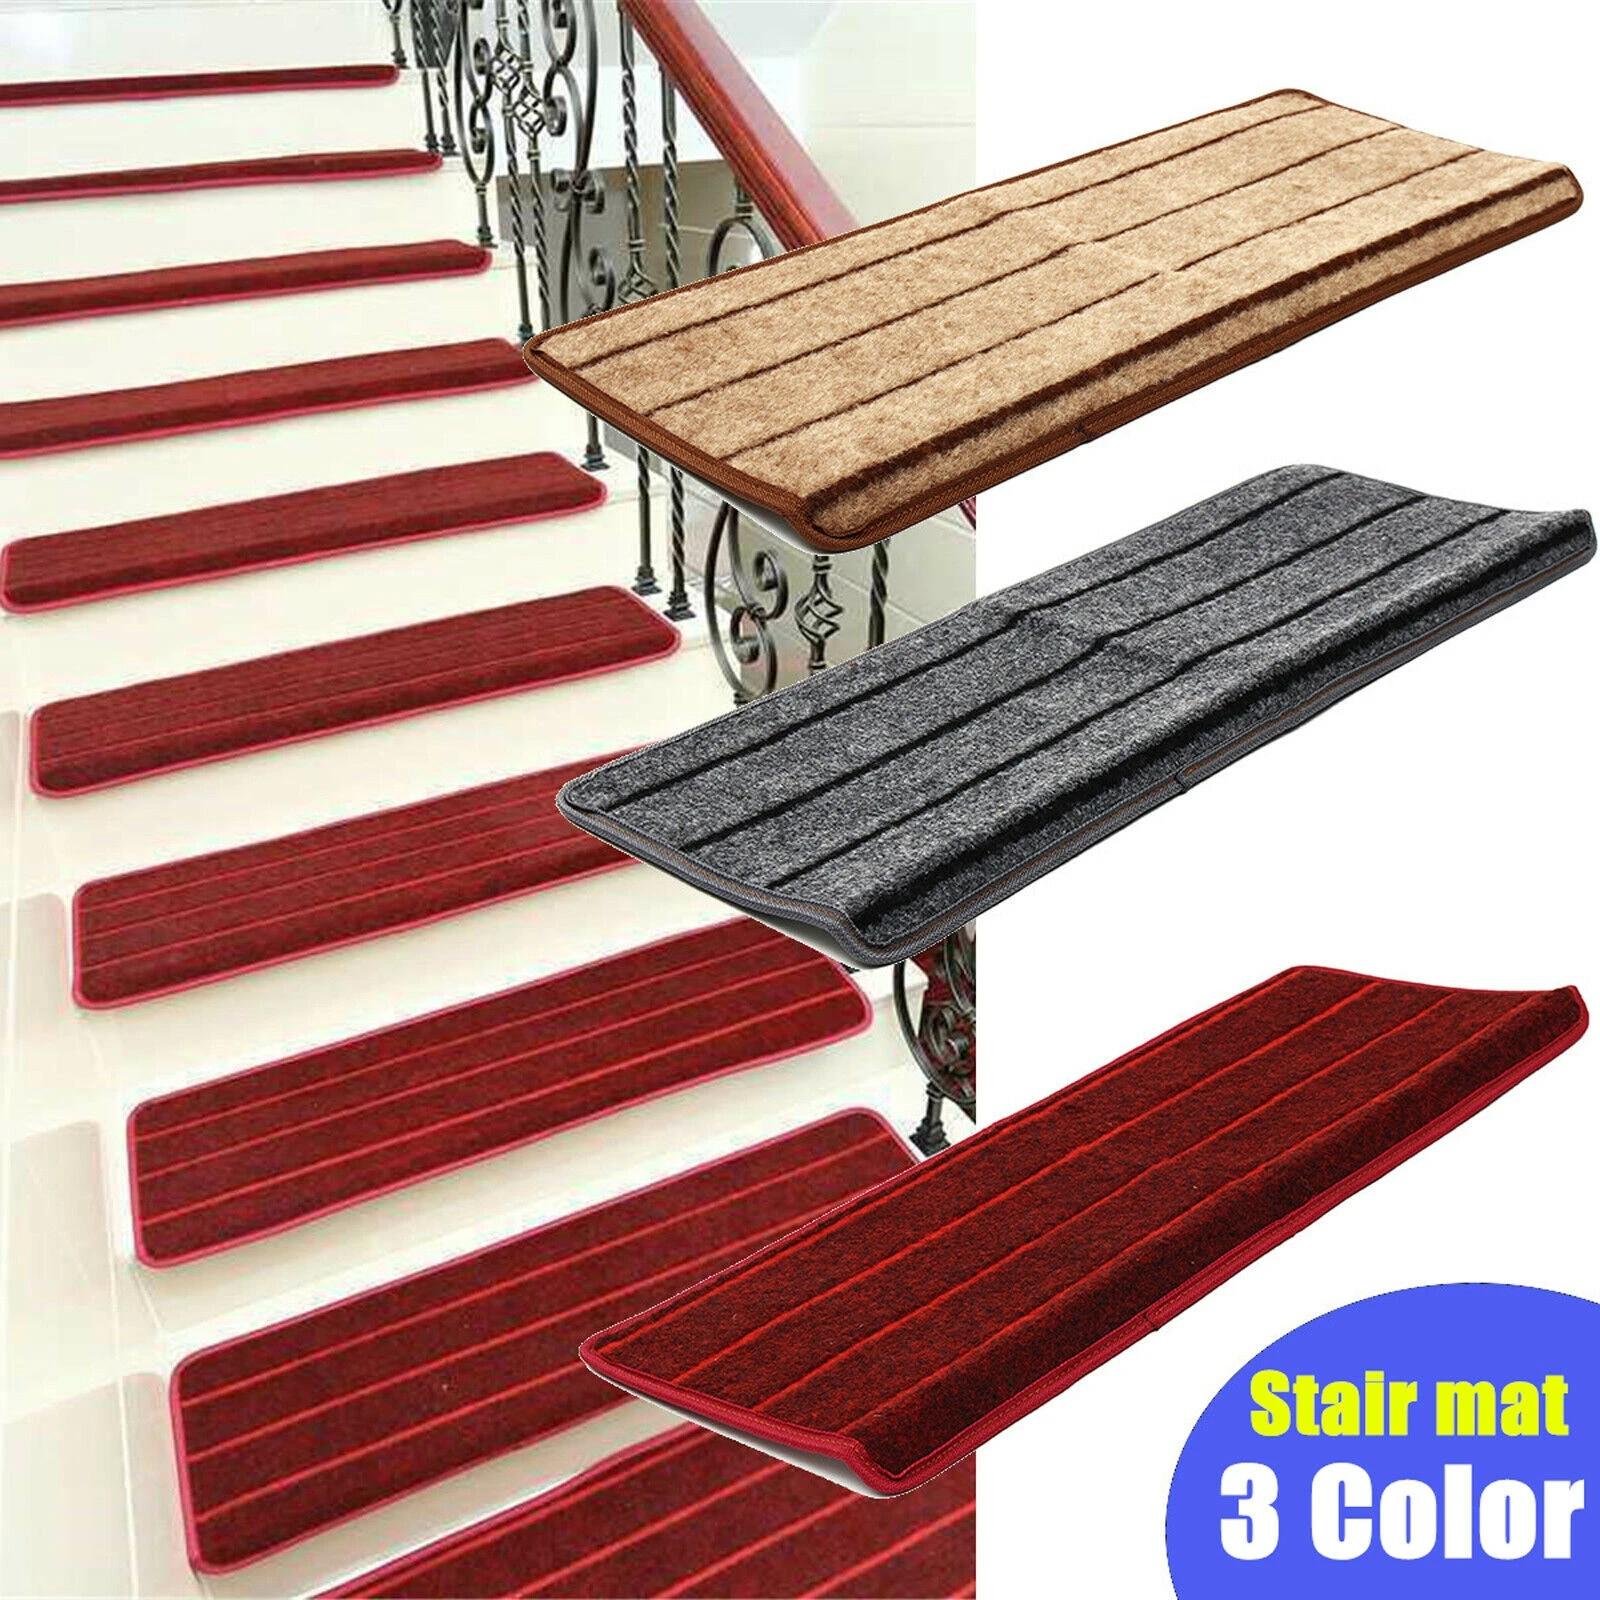 1PC Stair Mat Staircase Carpet Anti-skid Protector Mat Self-adhesive Treads Rug